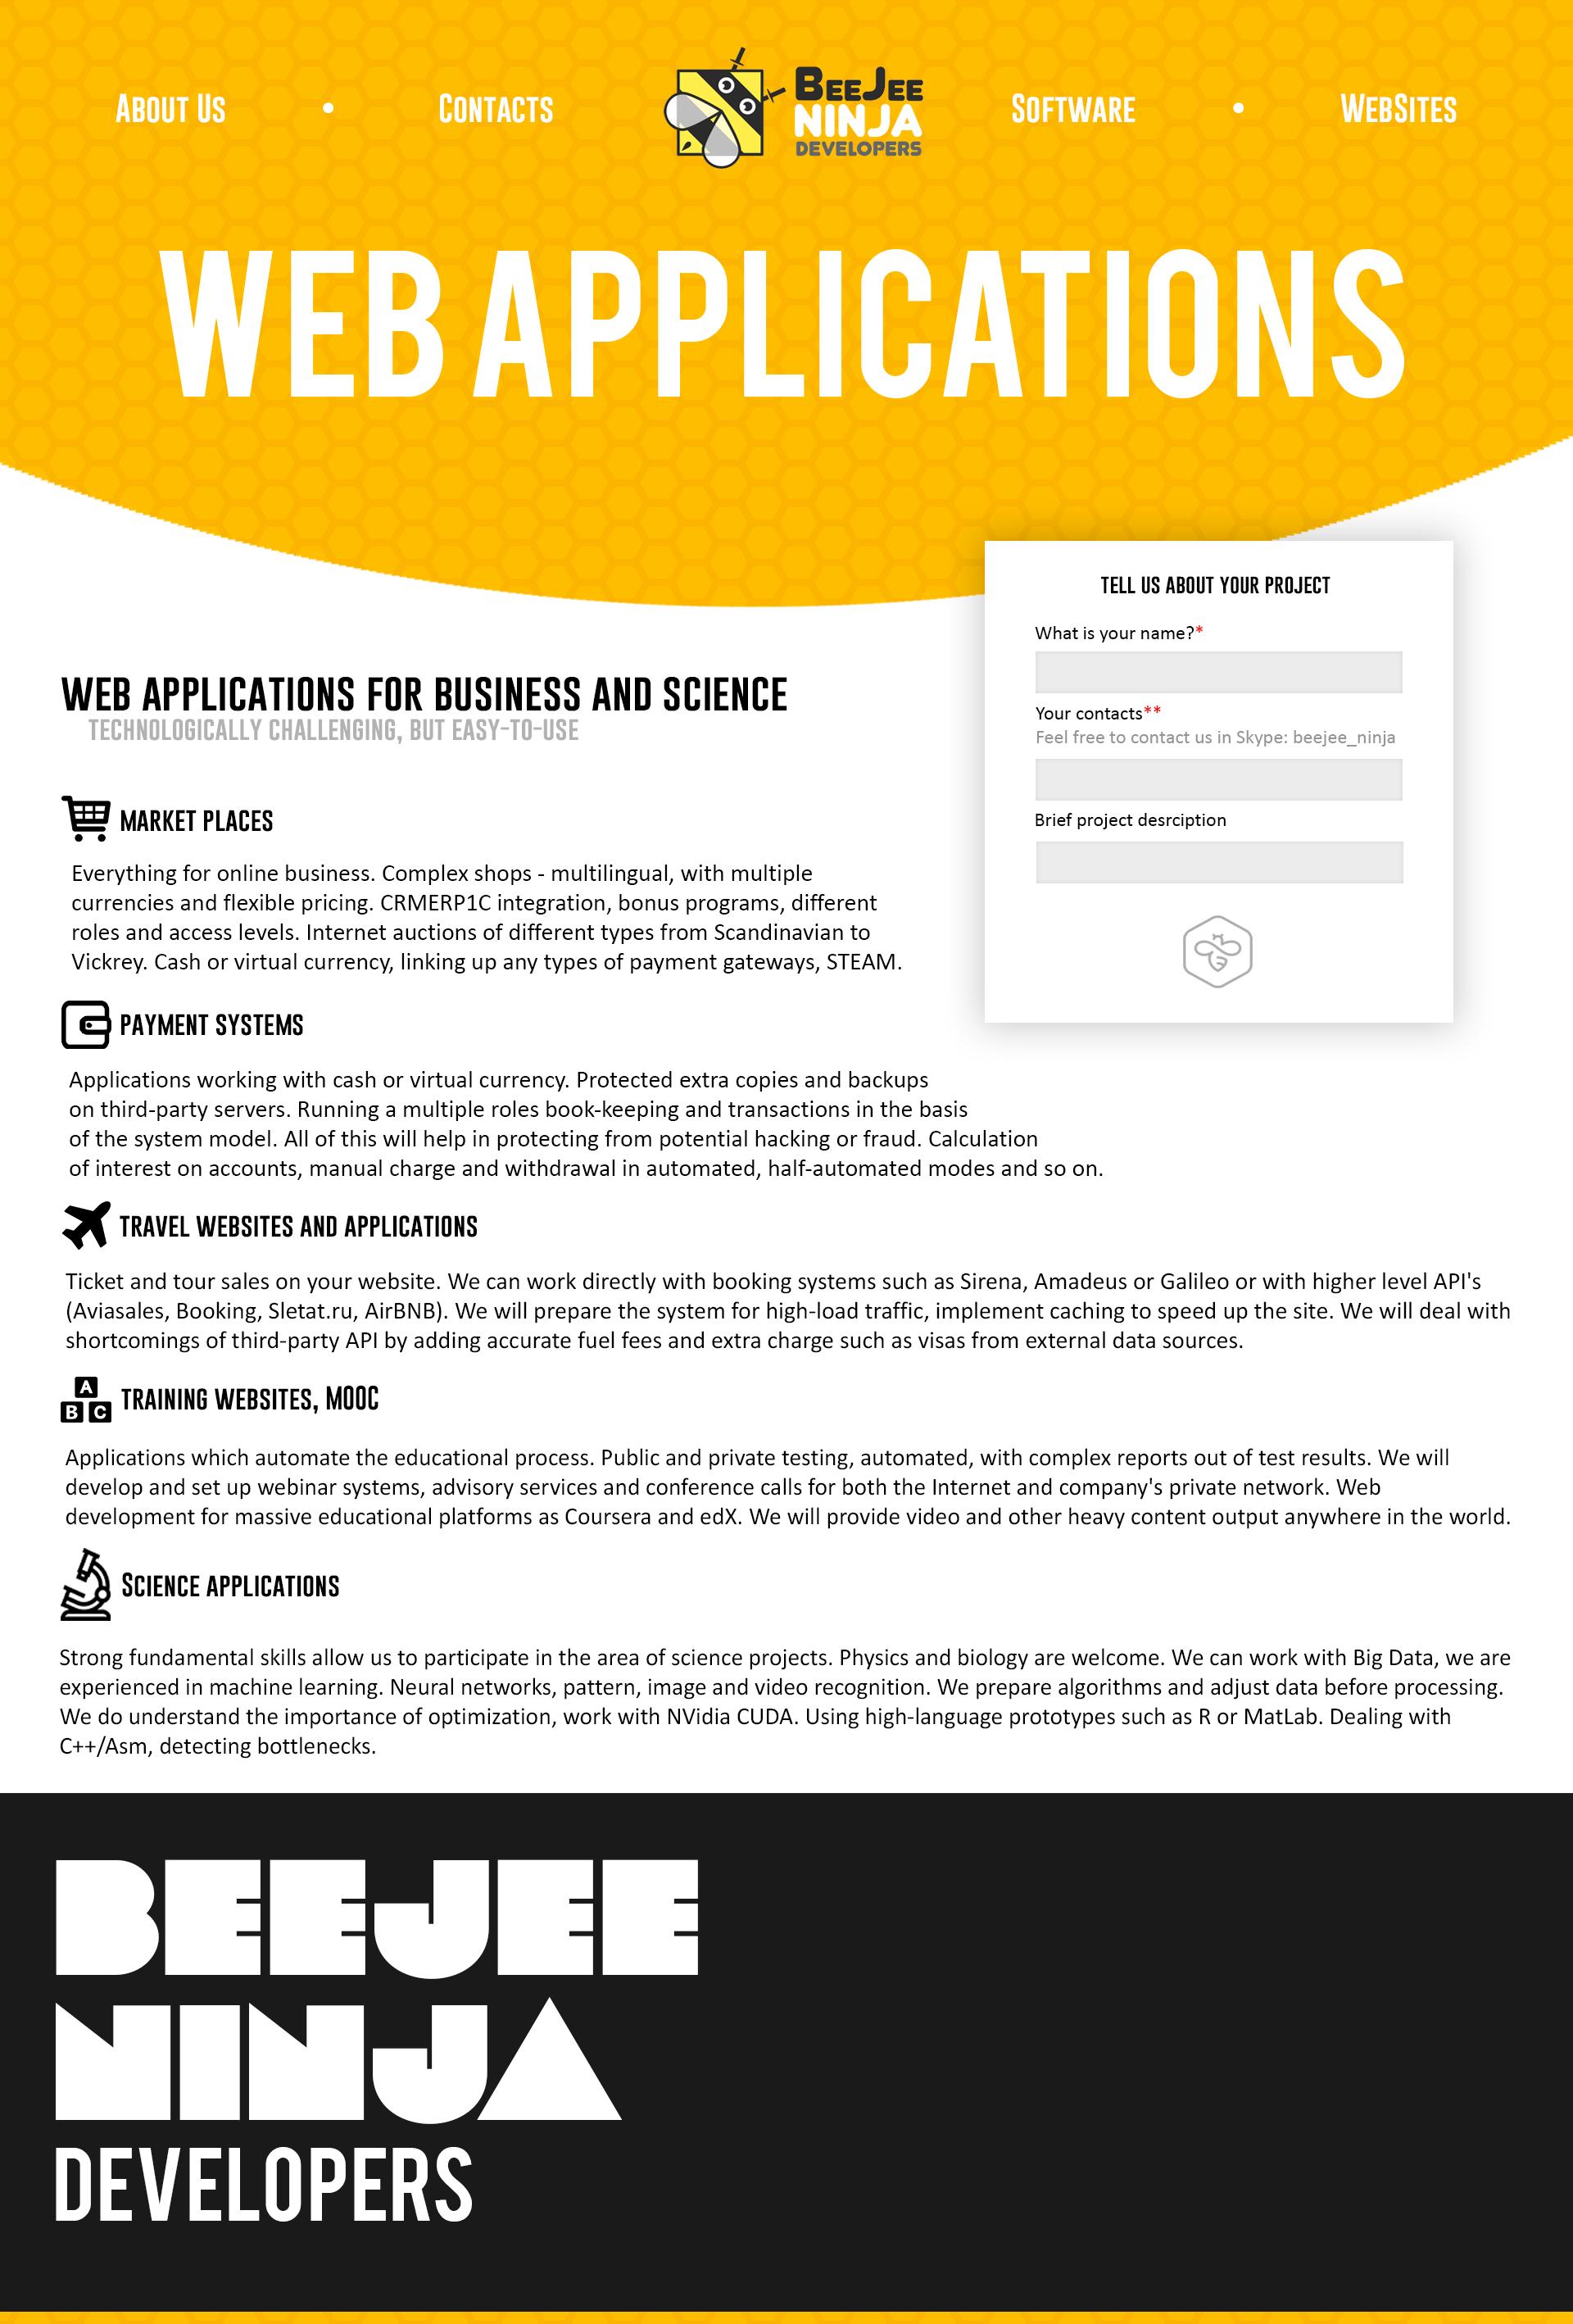 Концепт дизайна сайта в корпоративном стиле для IT компании фото f_350594c7d3dbe4d7.png